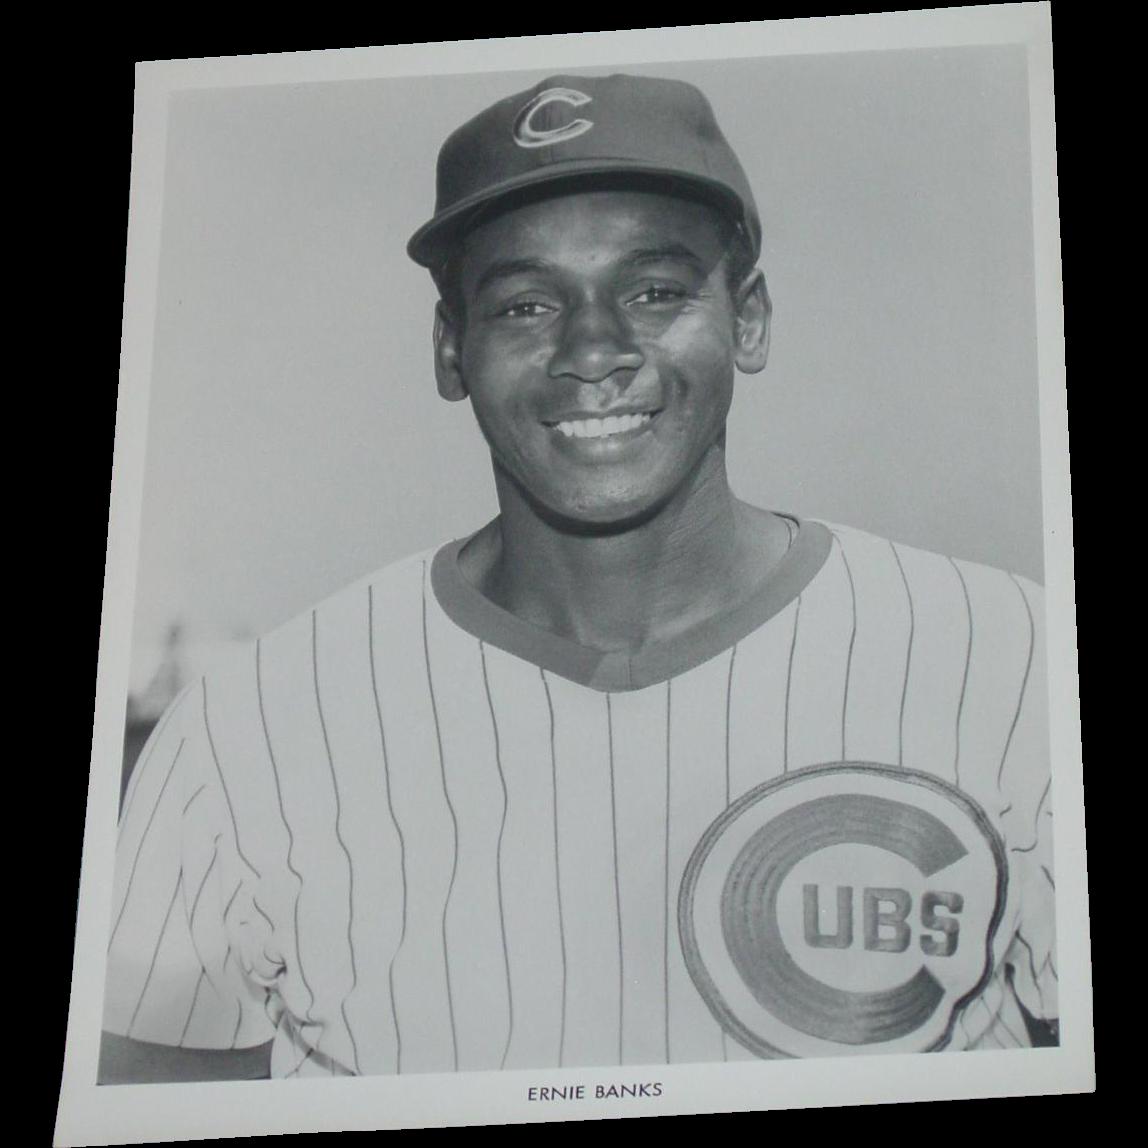 Chicago Cubs 1969 Ernie Banks Baseball Photo Original Press Photograph MLB 8 X 10 BW